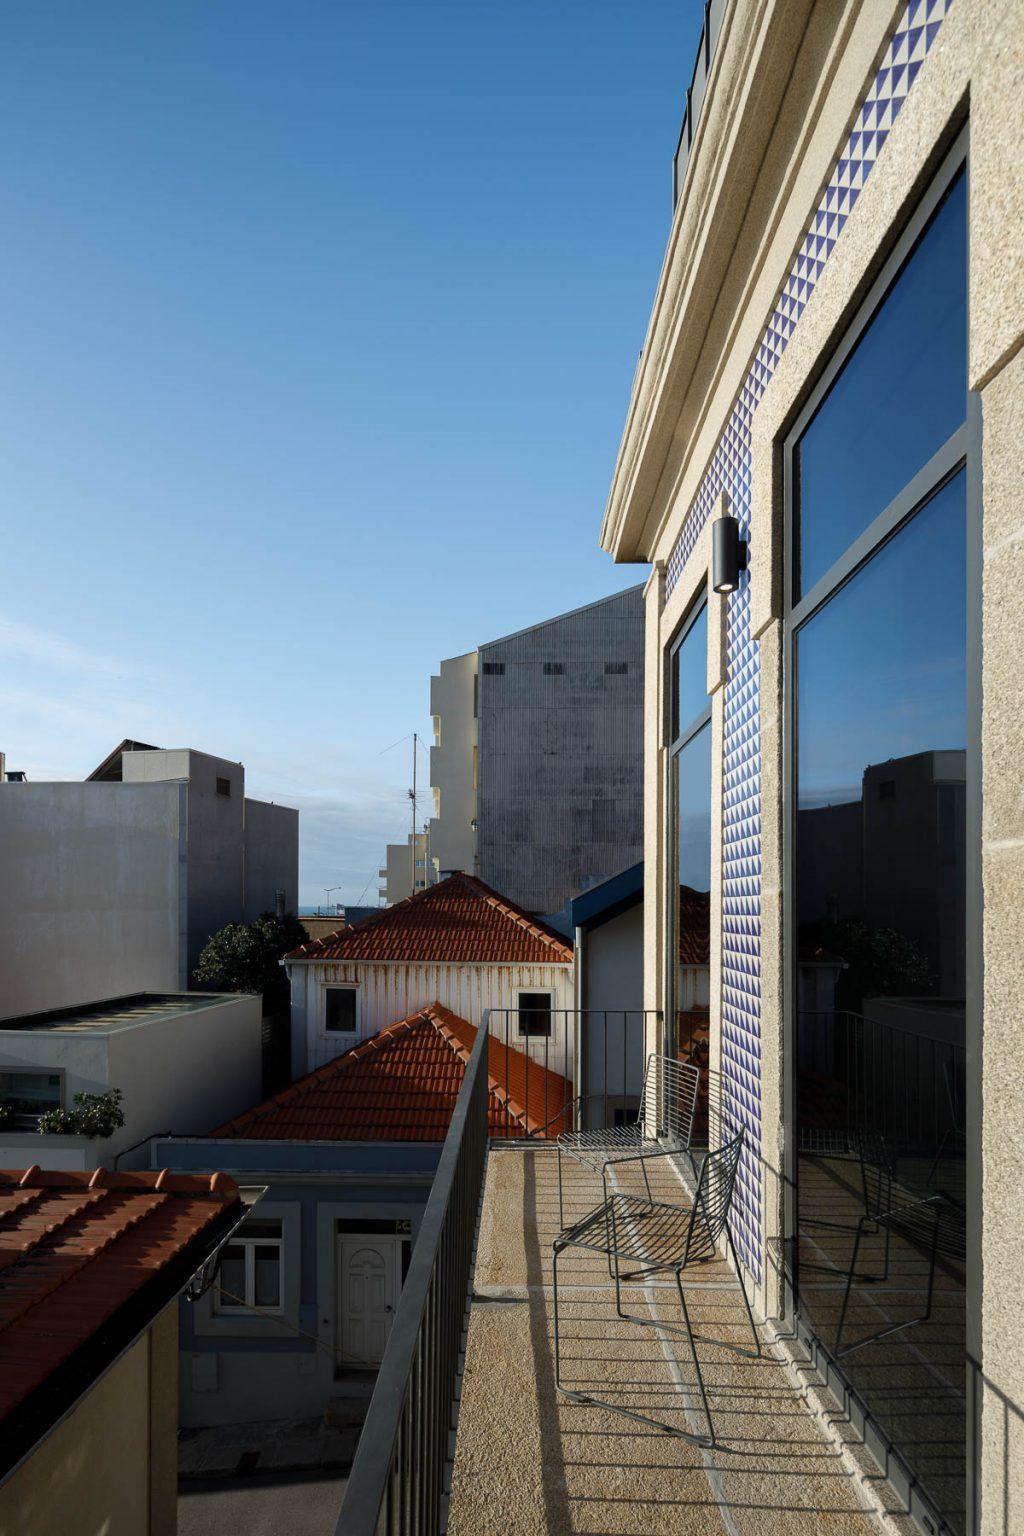 Renovation of a historic building in Foz, Porto - As Arquitectos